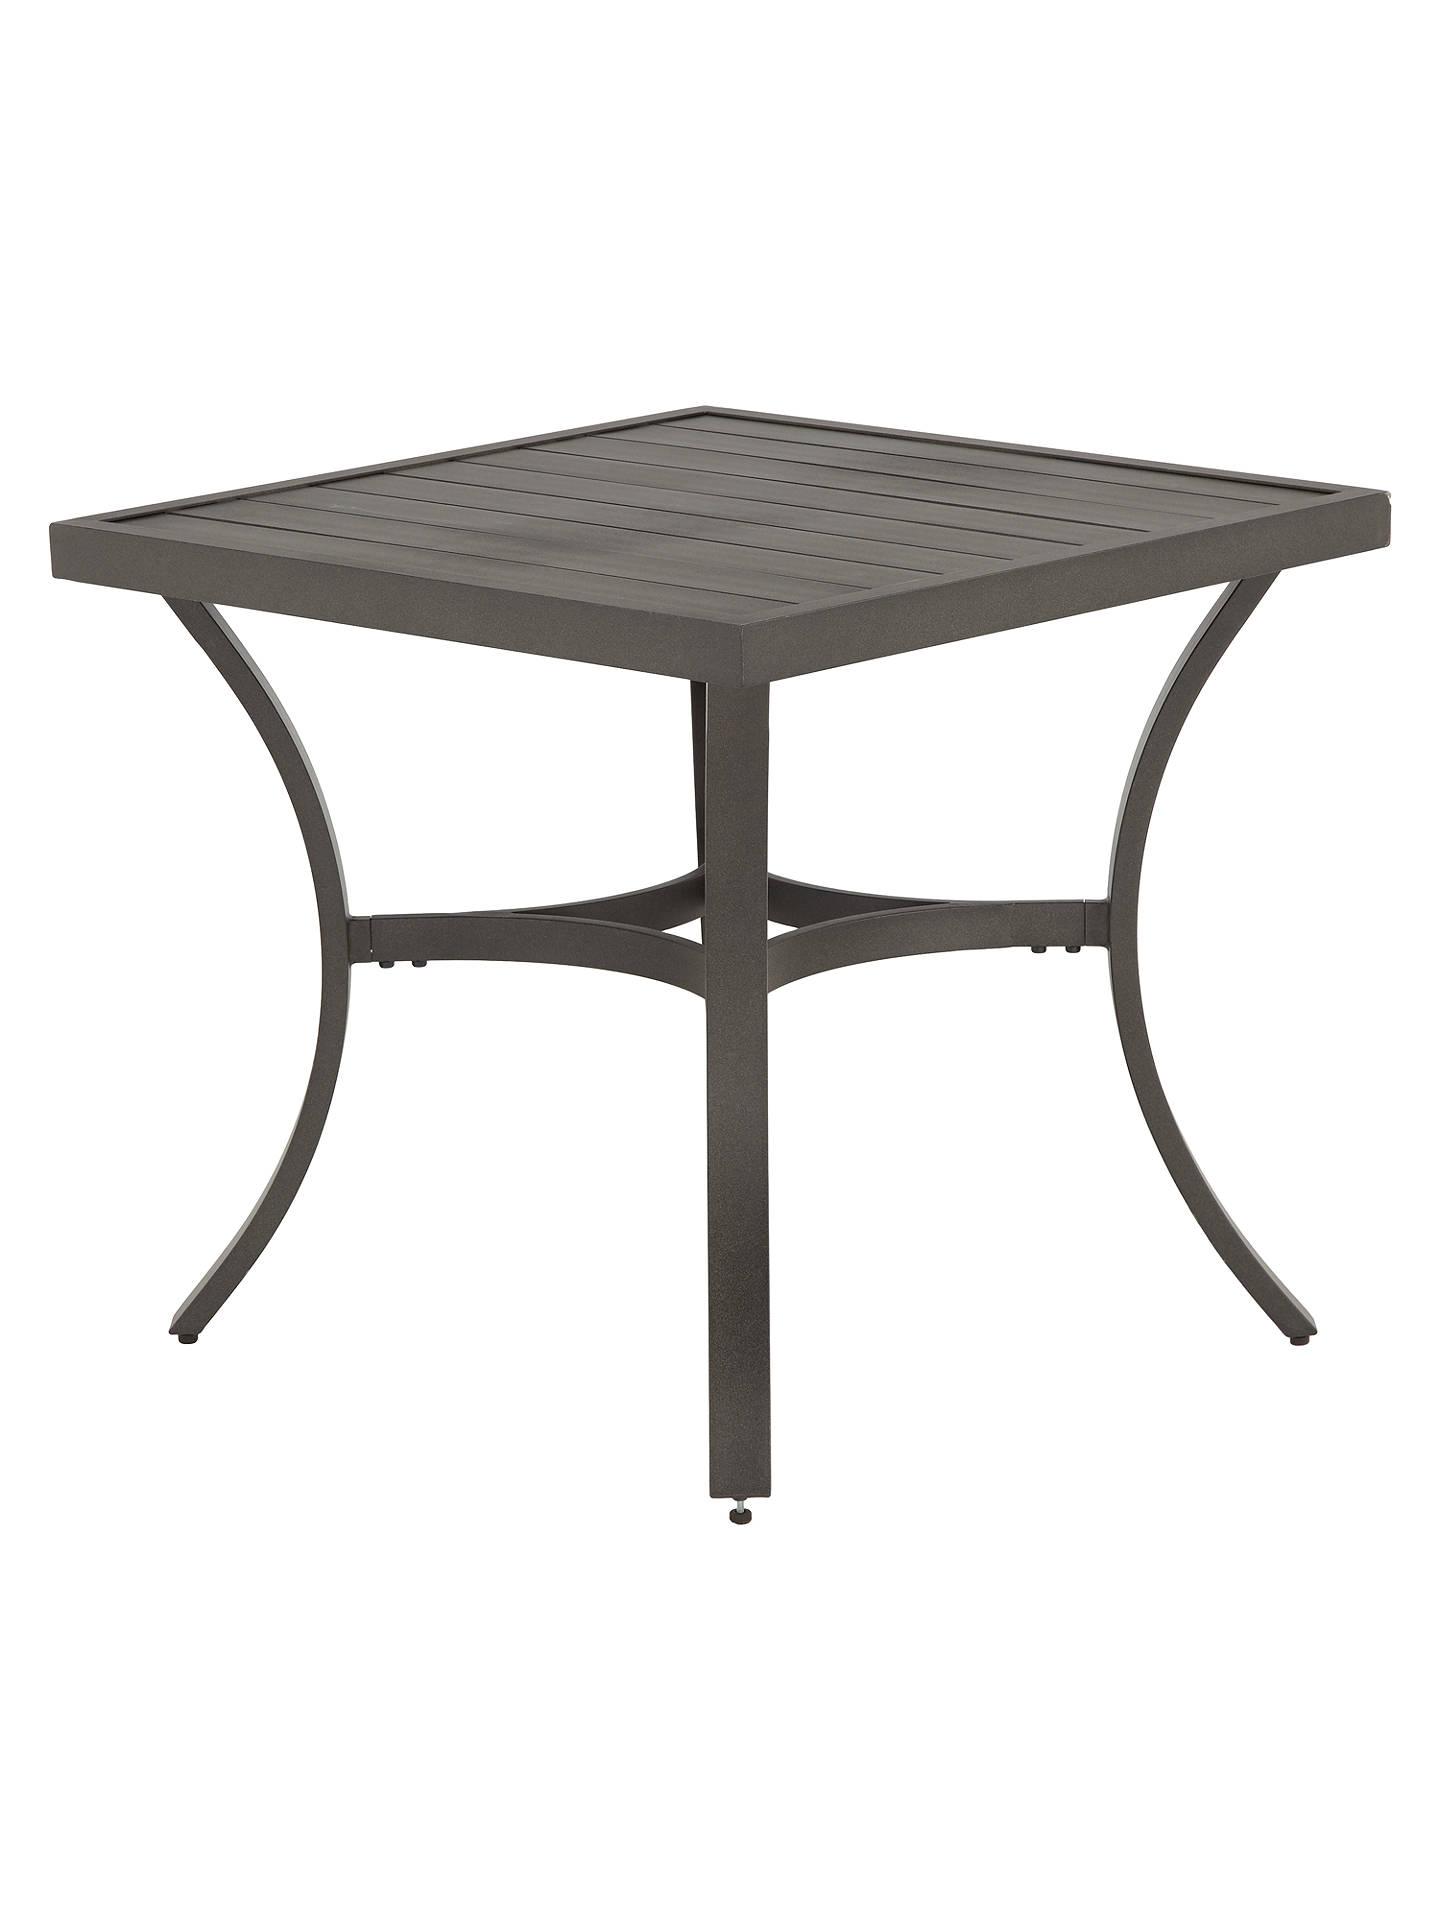 Buy john lewis partners marlow aluminium 4 seater garden dining table black grey